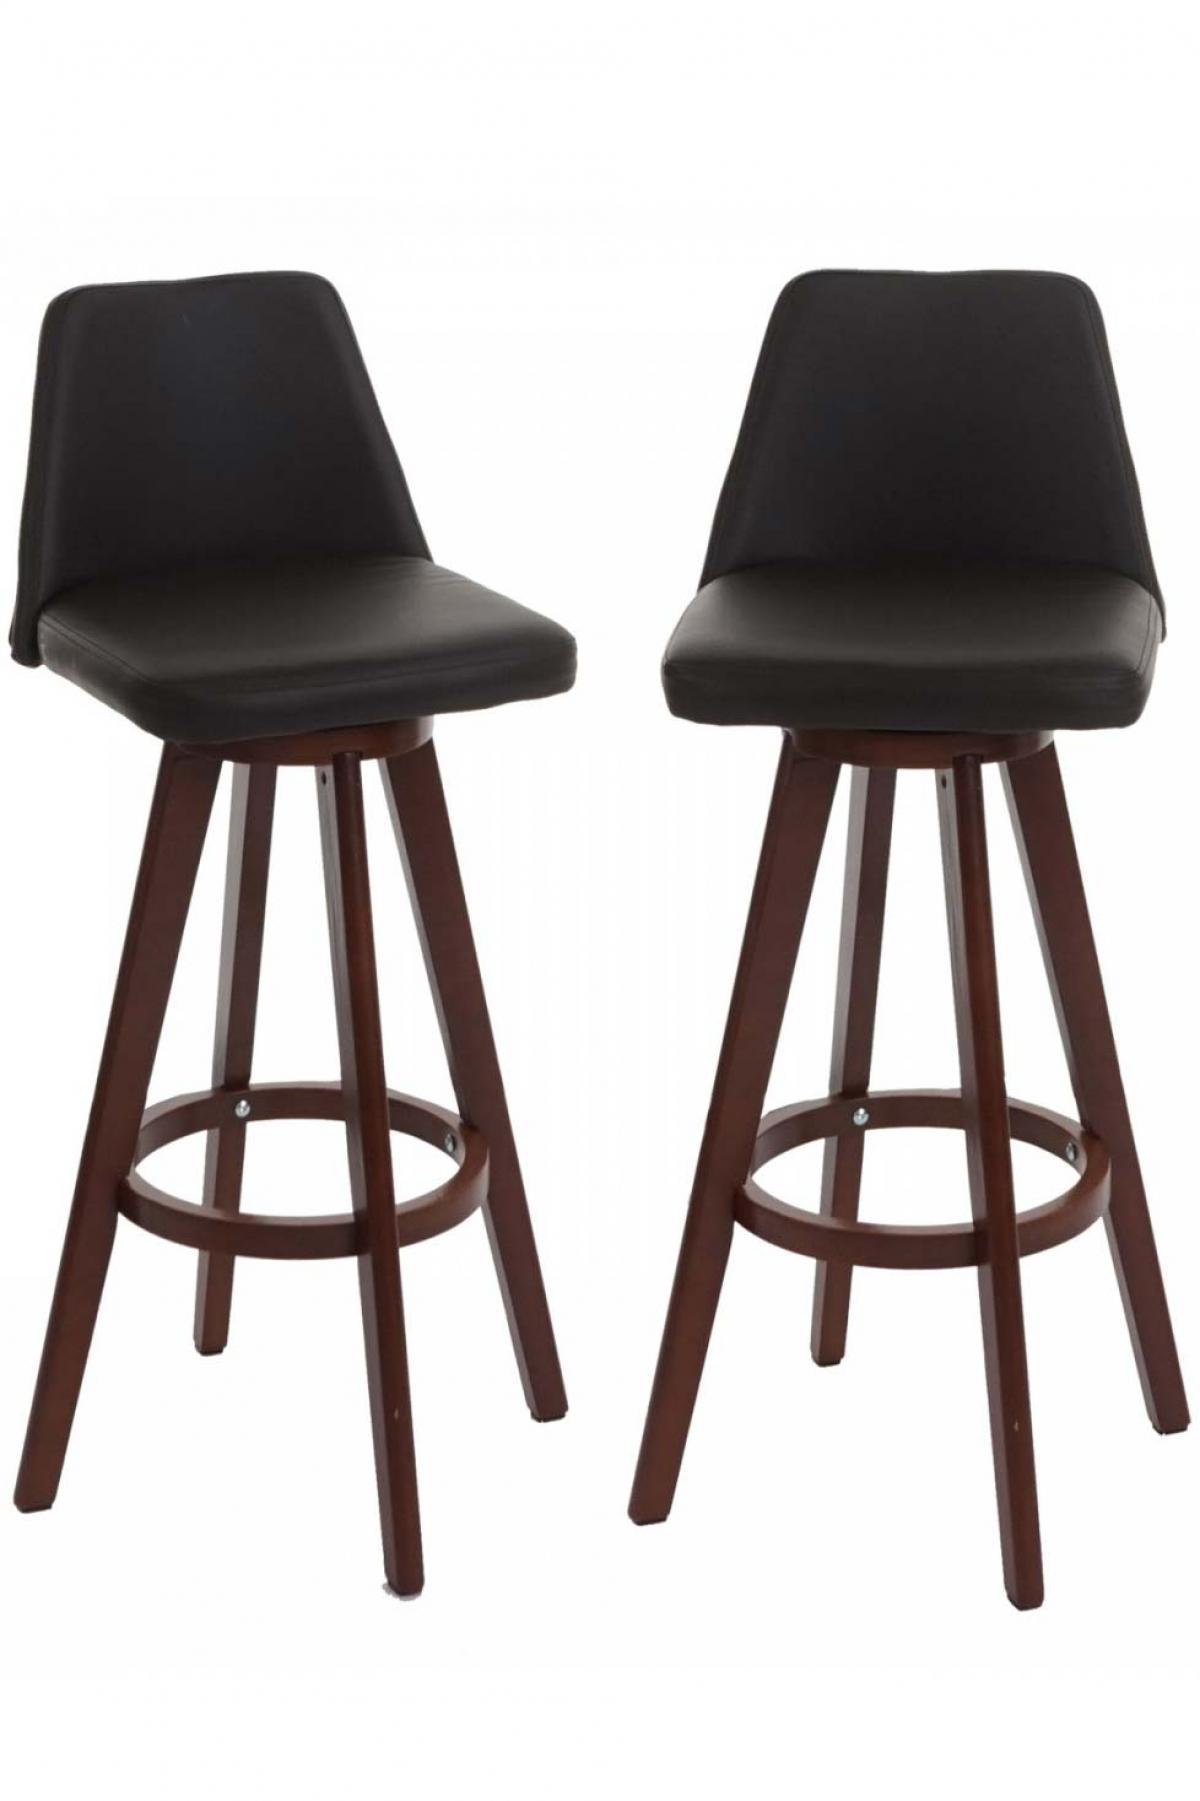 1f09df5728b8e Barová stolička Boras (SET 2 ks) | Design-shop.sk